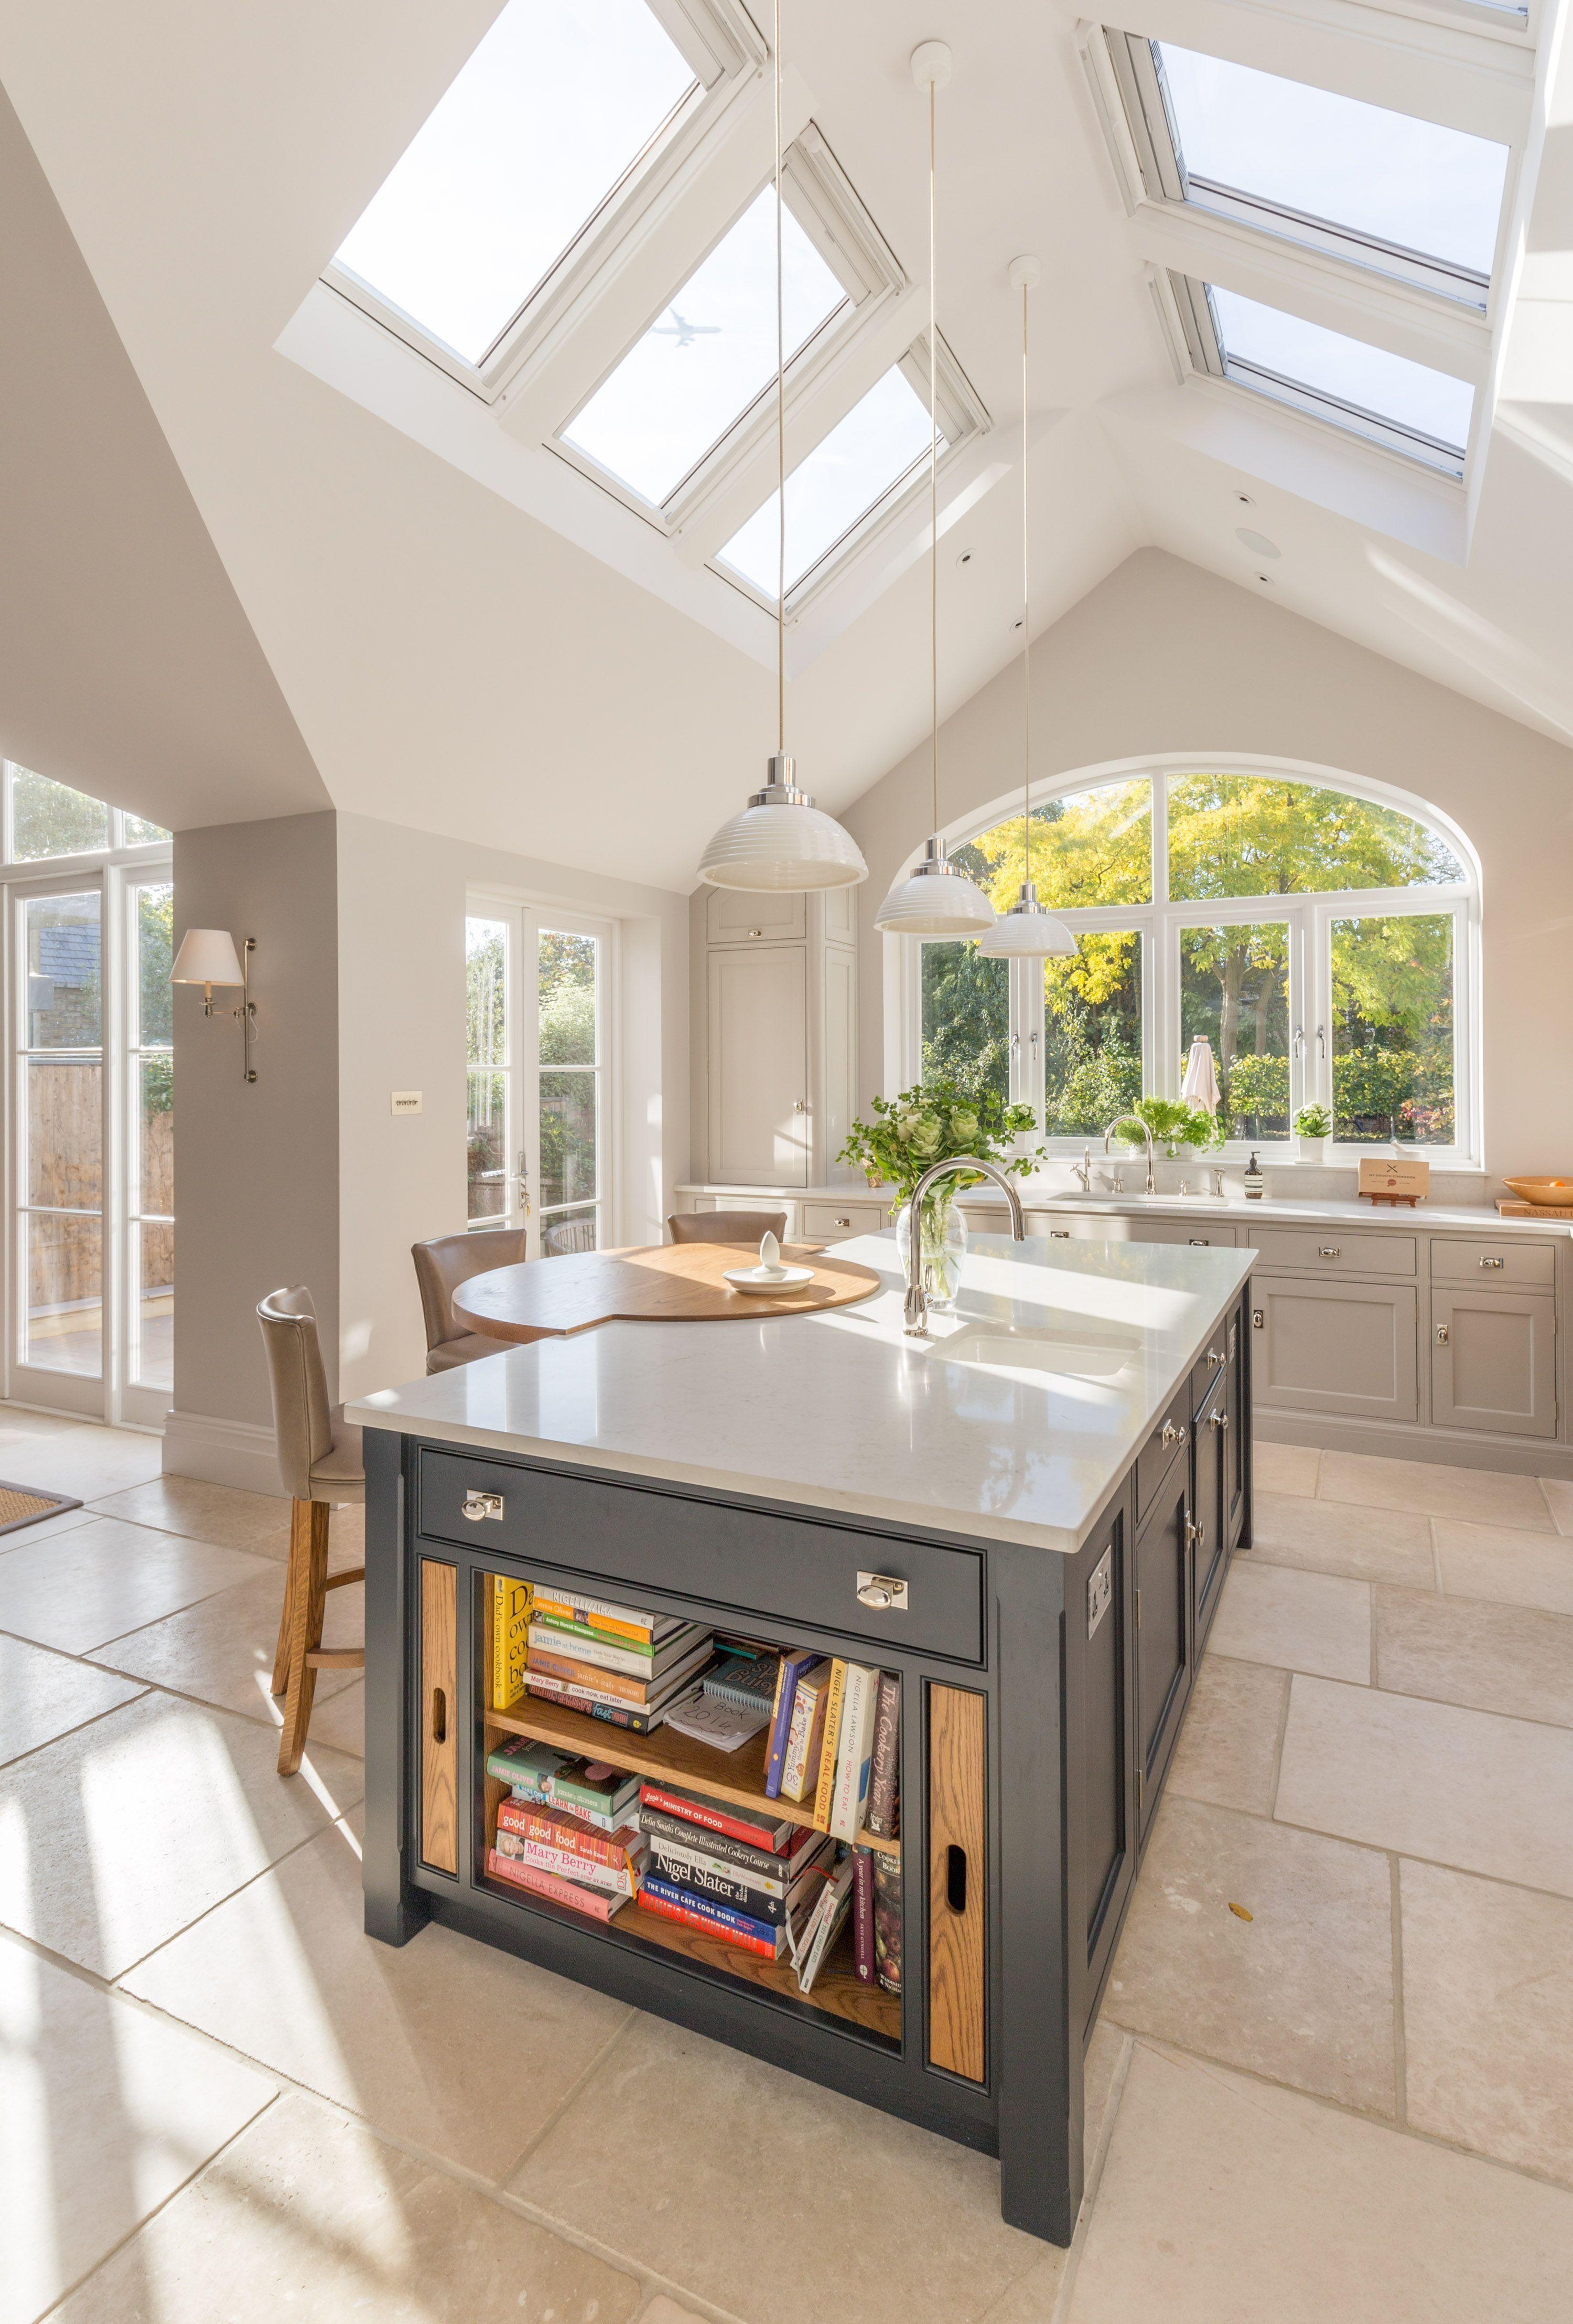 21 Wonderful Open Plan Kitchen With Feature Island Ideas 21